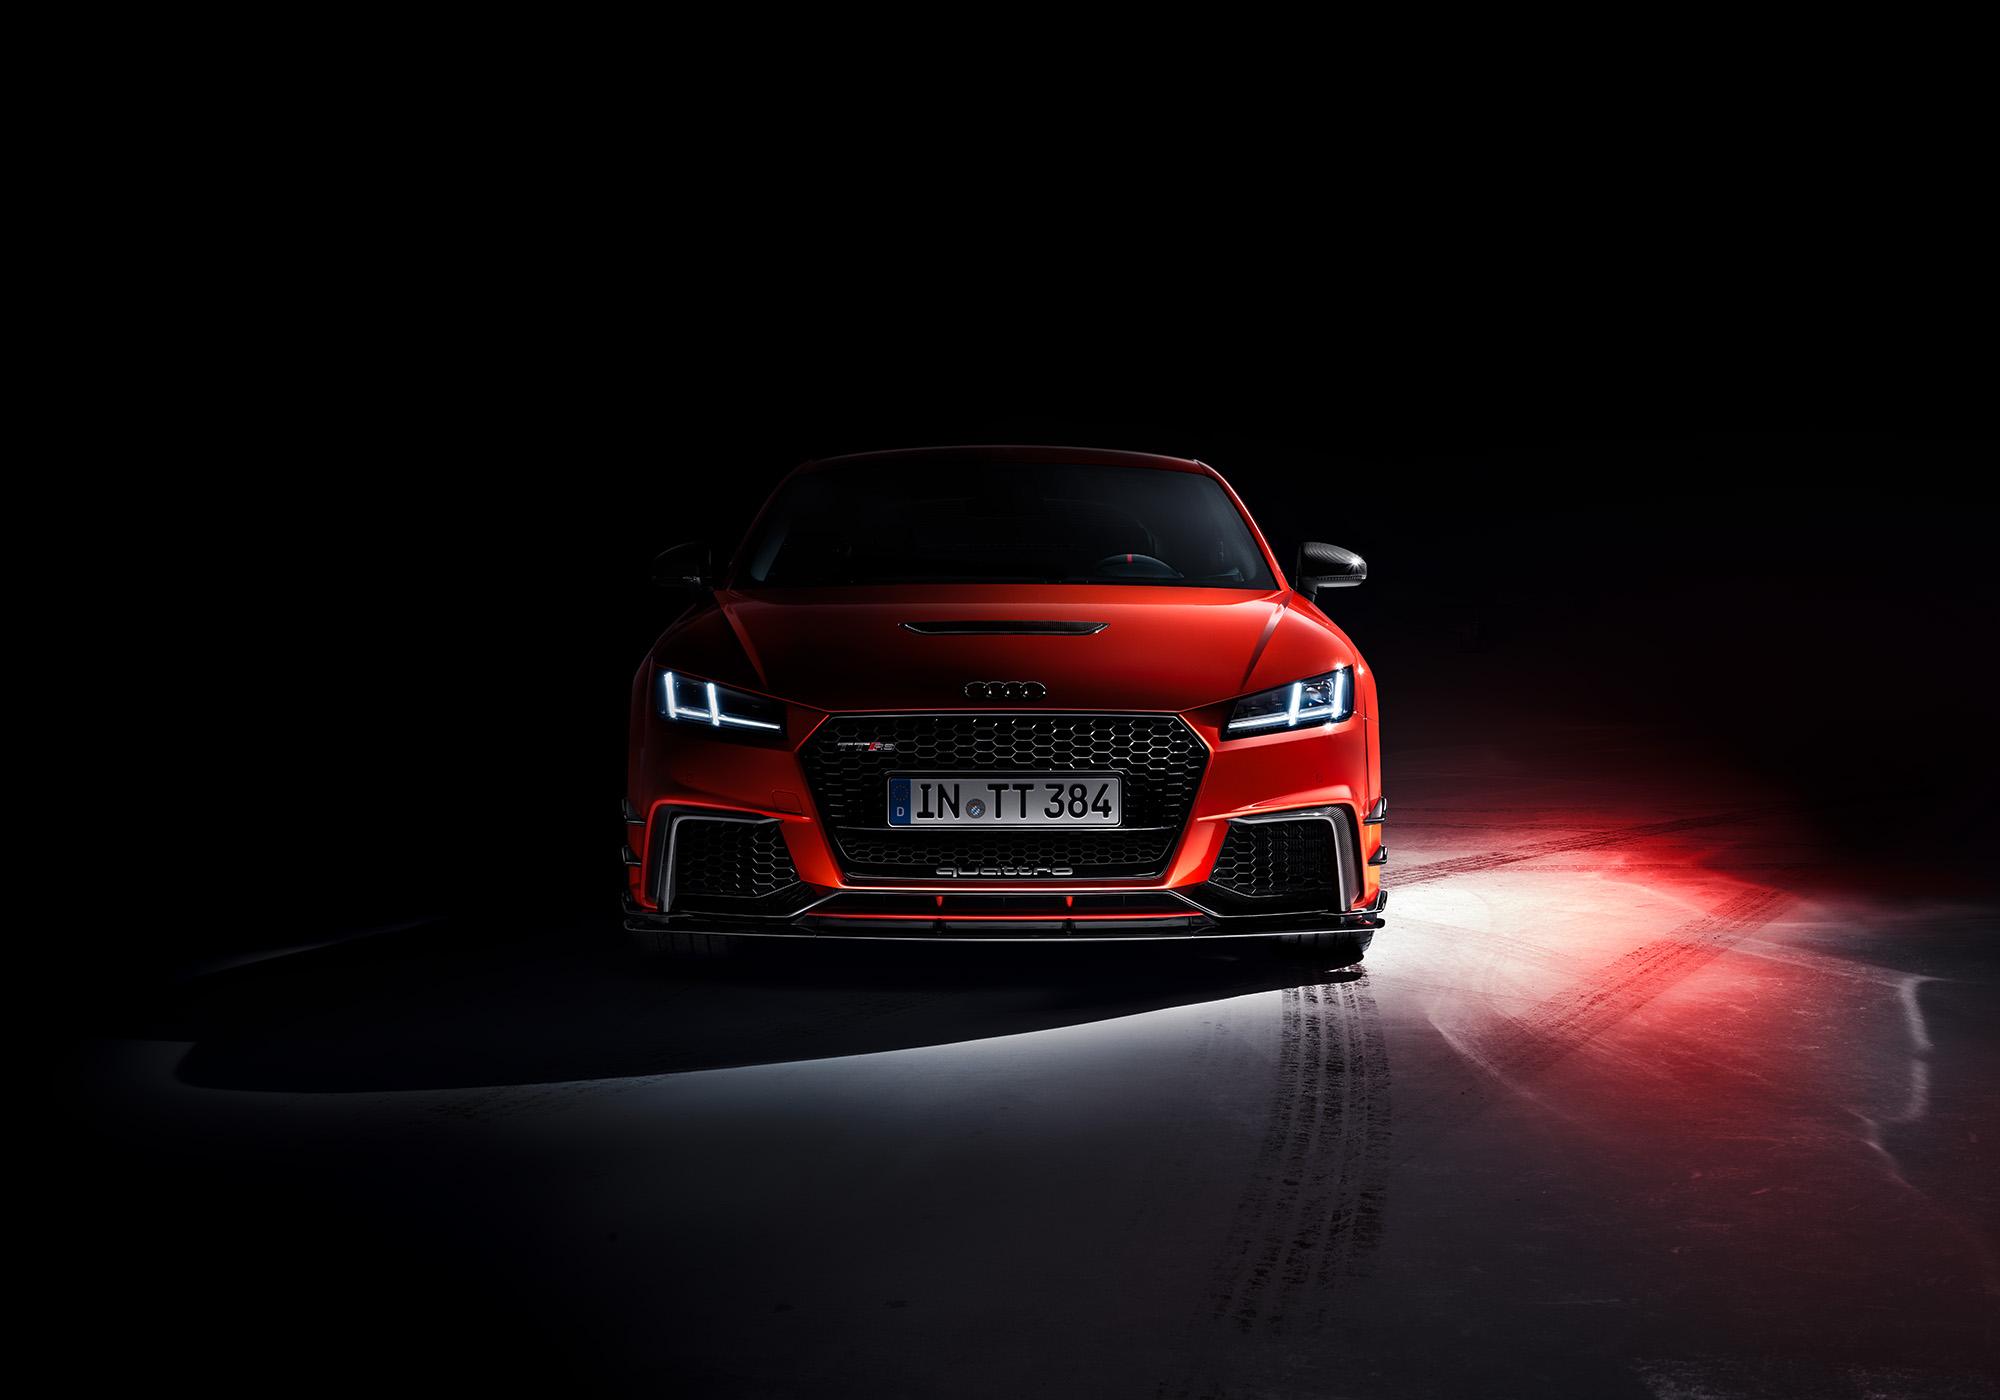 Client Audi | Photographer Frederic Schlosser | Agency Philipp und Keuntje